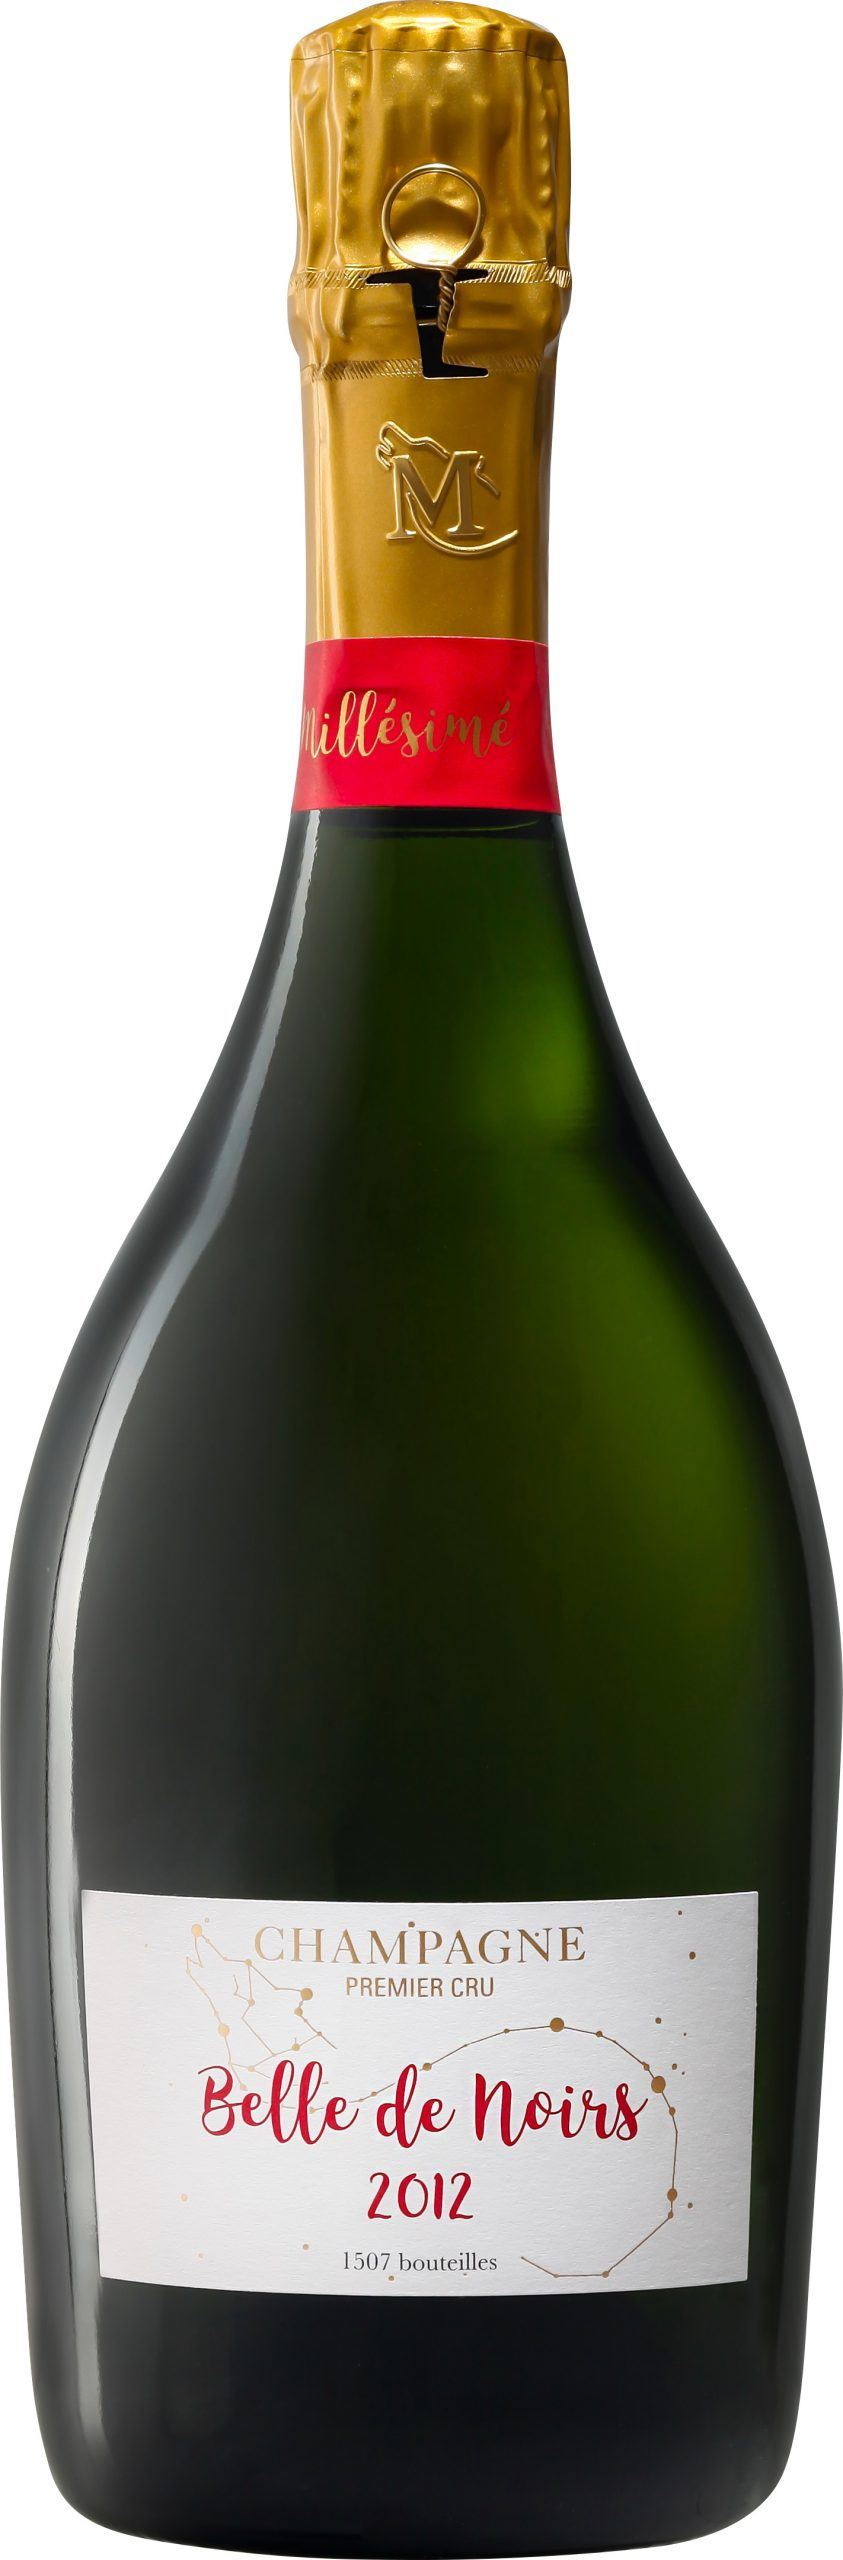 Belle de Noirs - Champagne Guy Mea